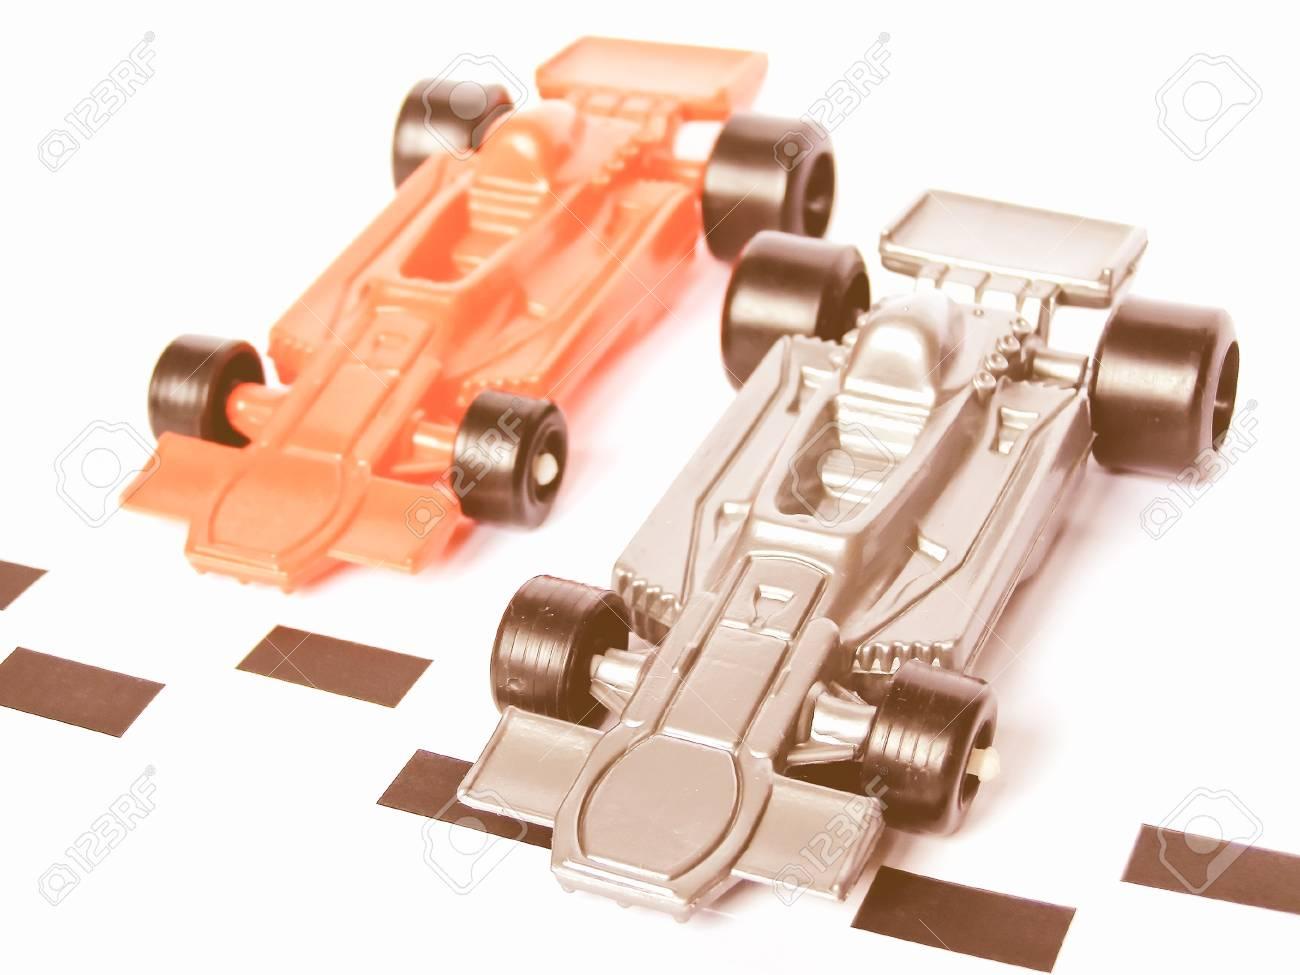 Antiguos Juguetes Modelo Fórmula Coches Carreras Uno F1 De 80wPXnOk